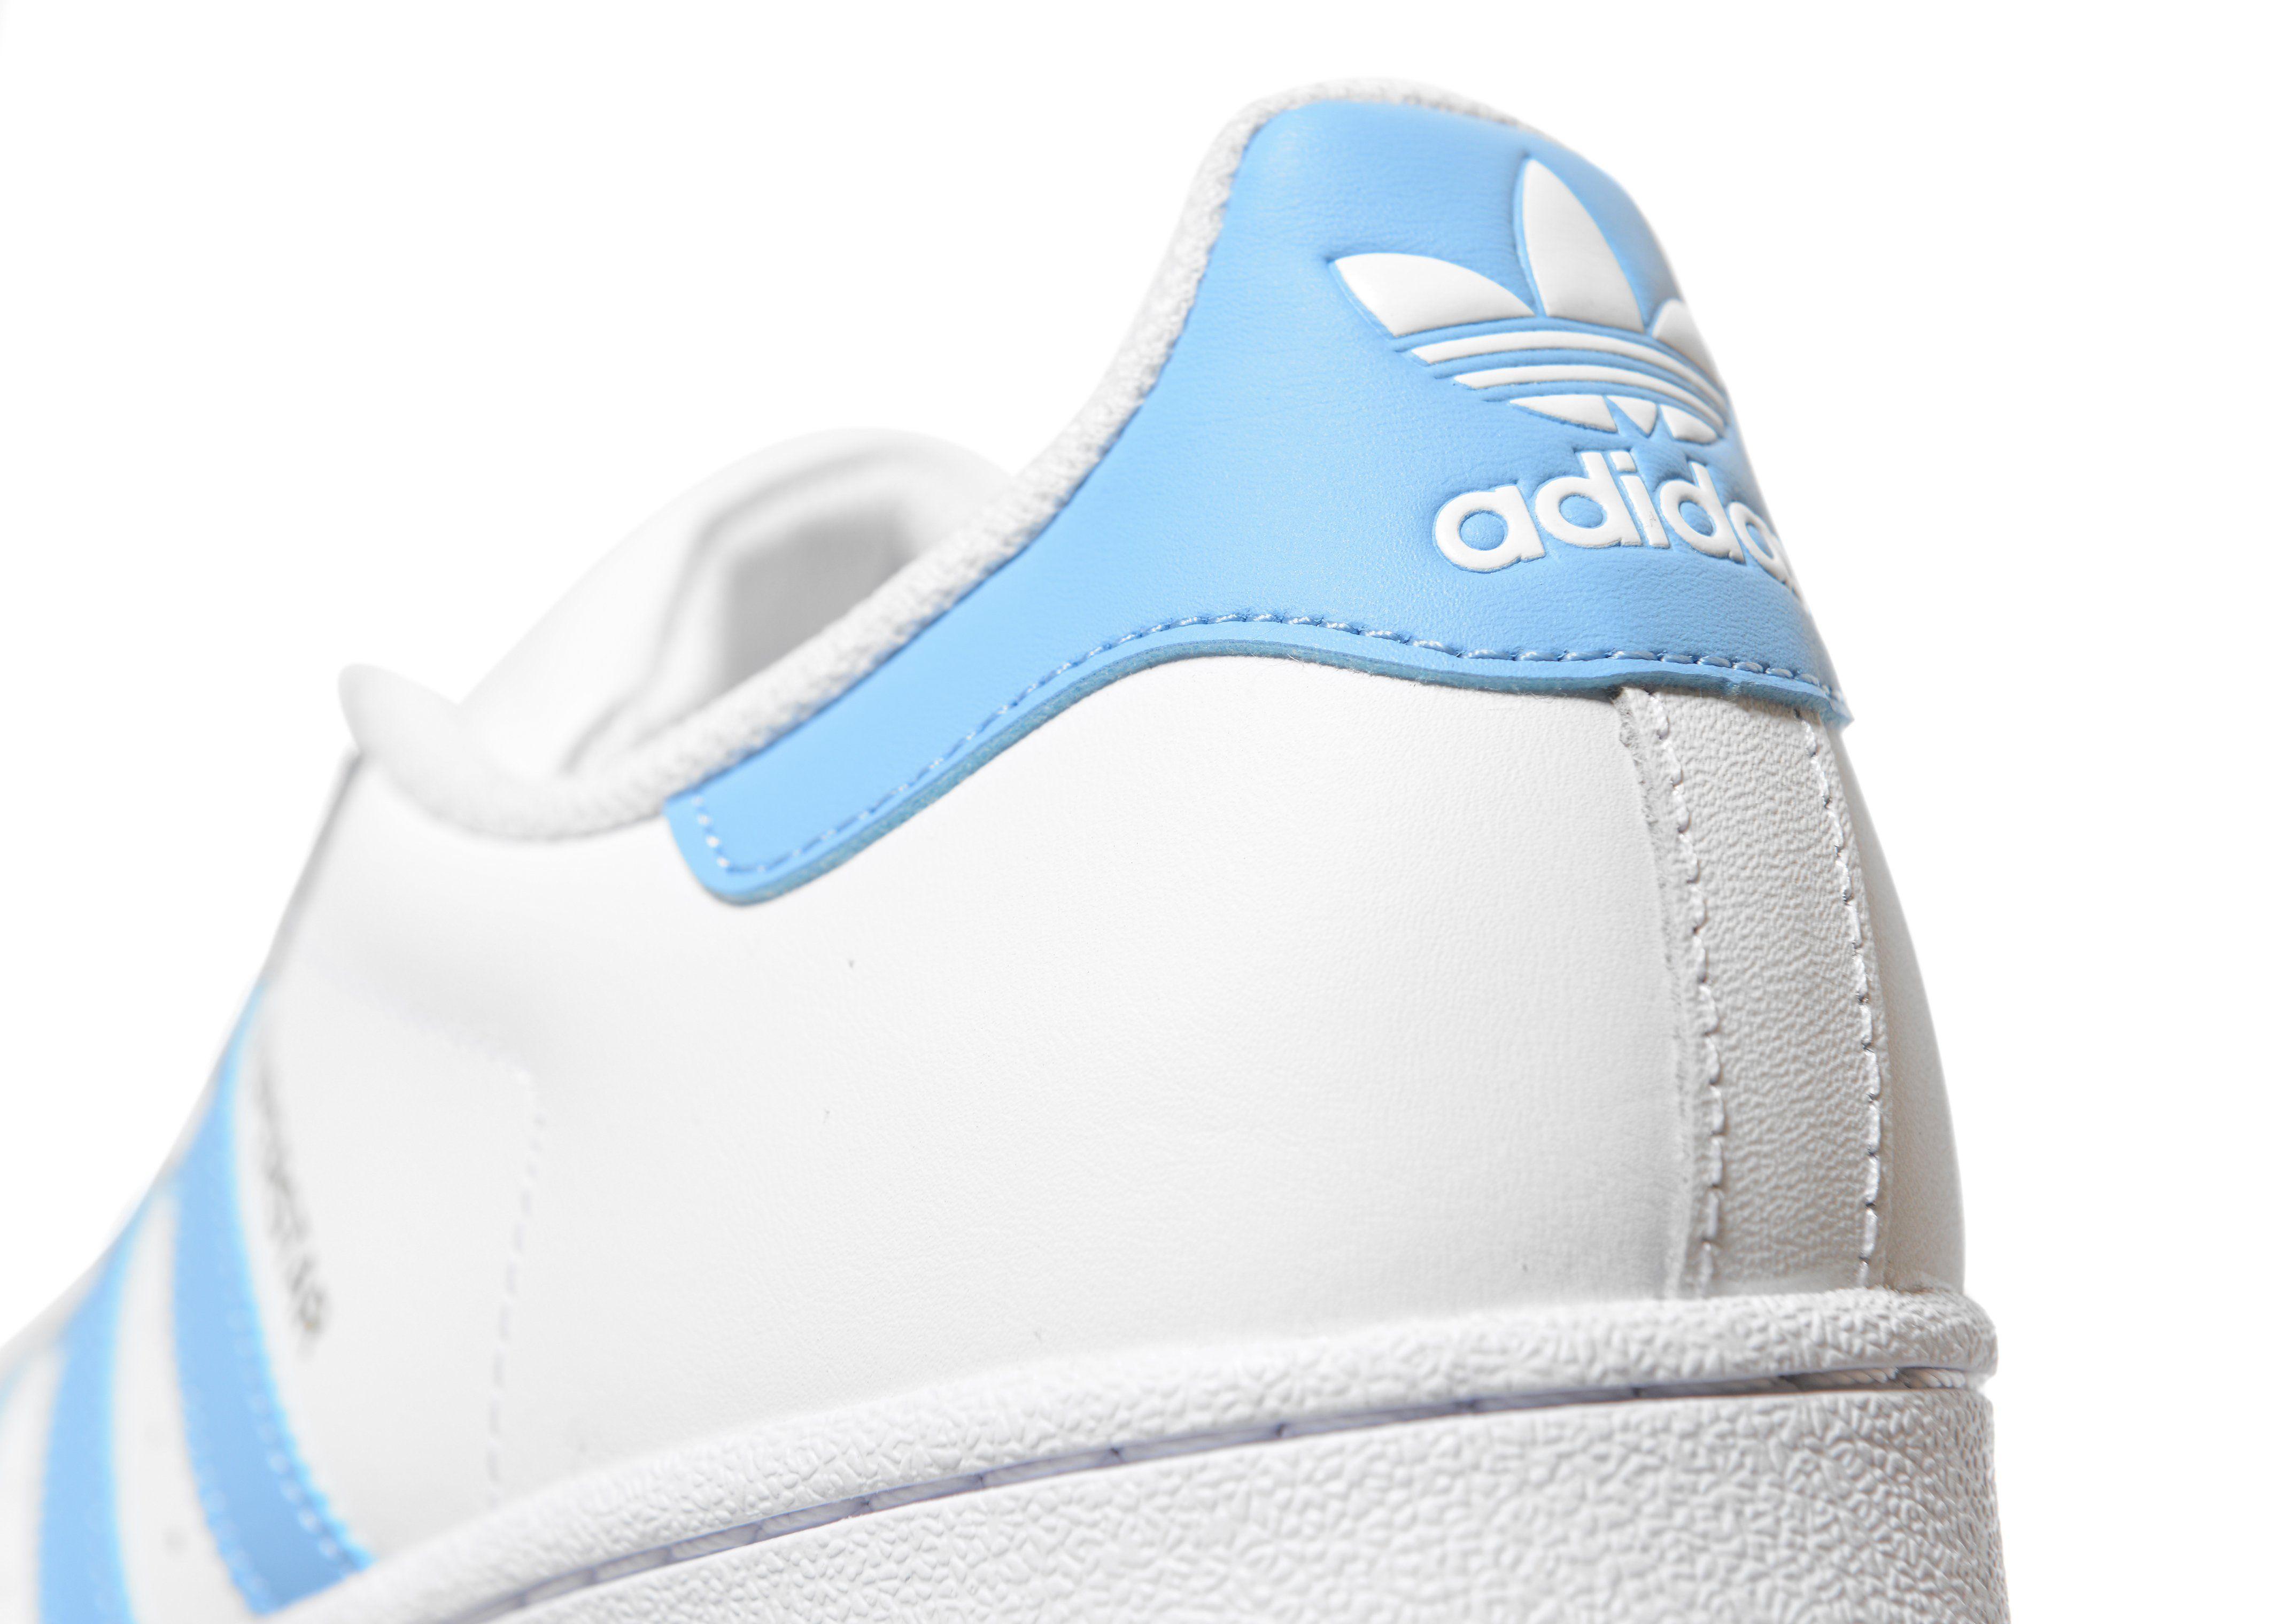 Adidas superstar due donne a cinghia rita o inchiostro blu